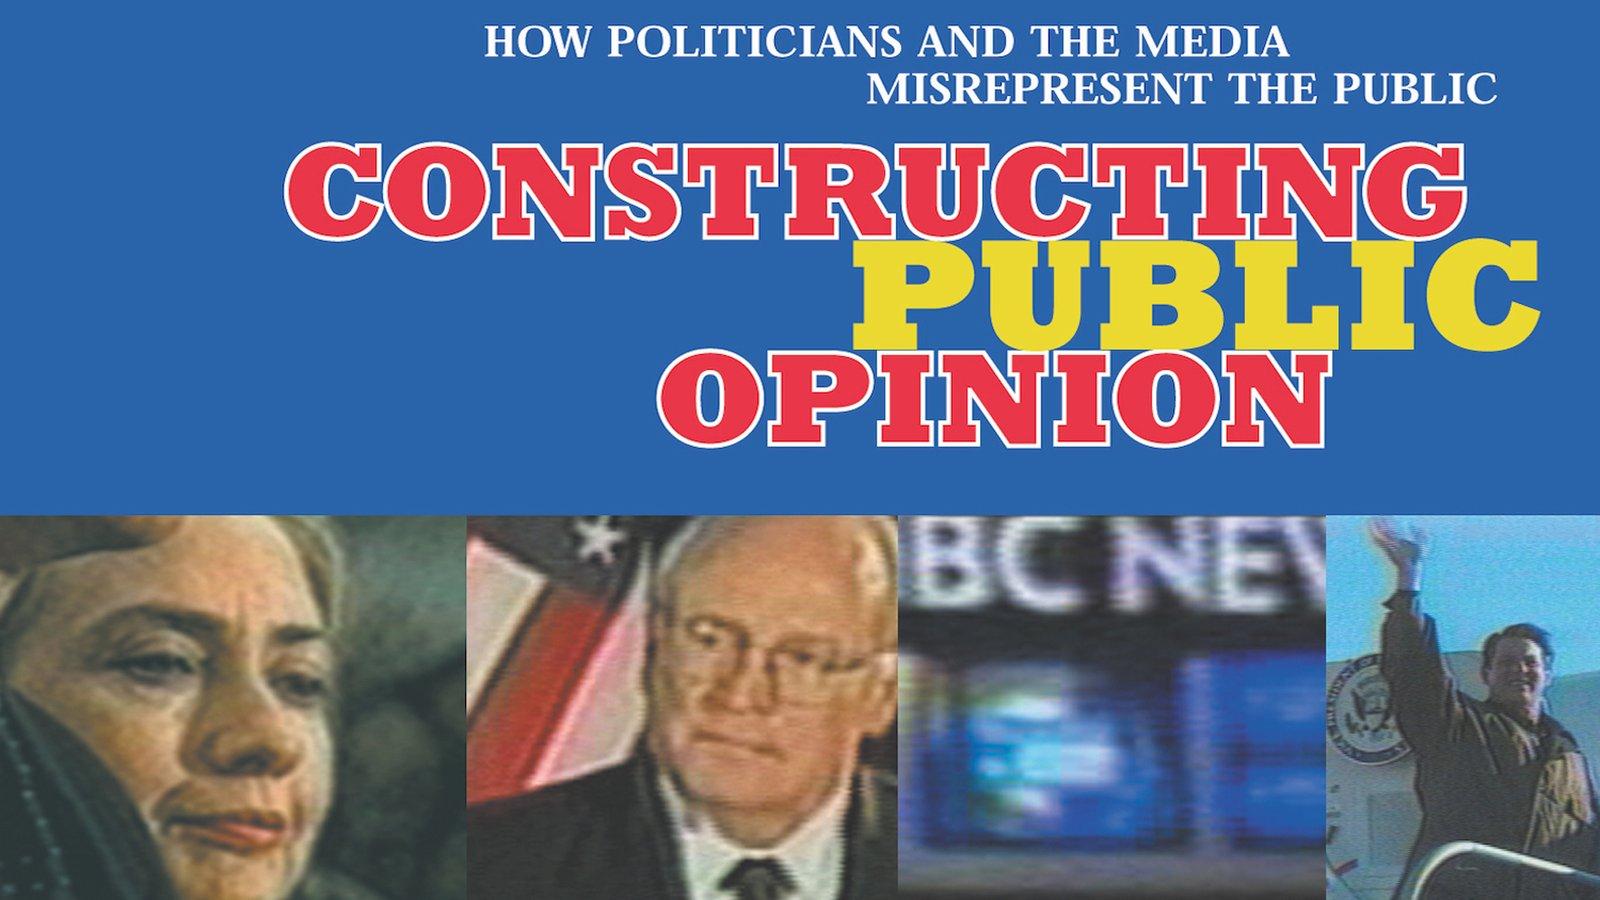 Constructing Public Opinion - How Politicians & the Media Misrepresent the Public